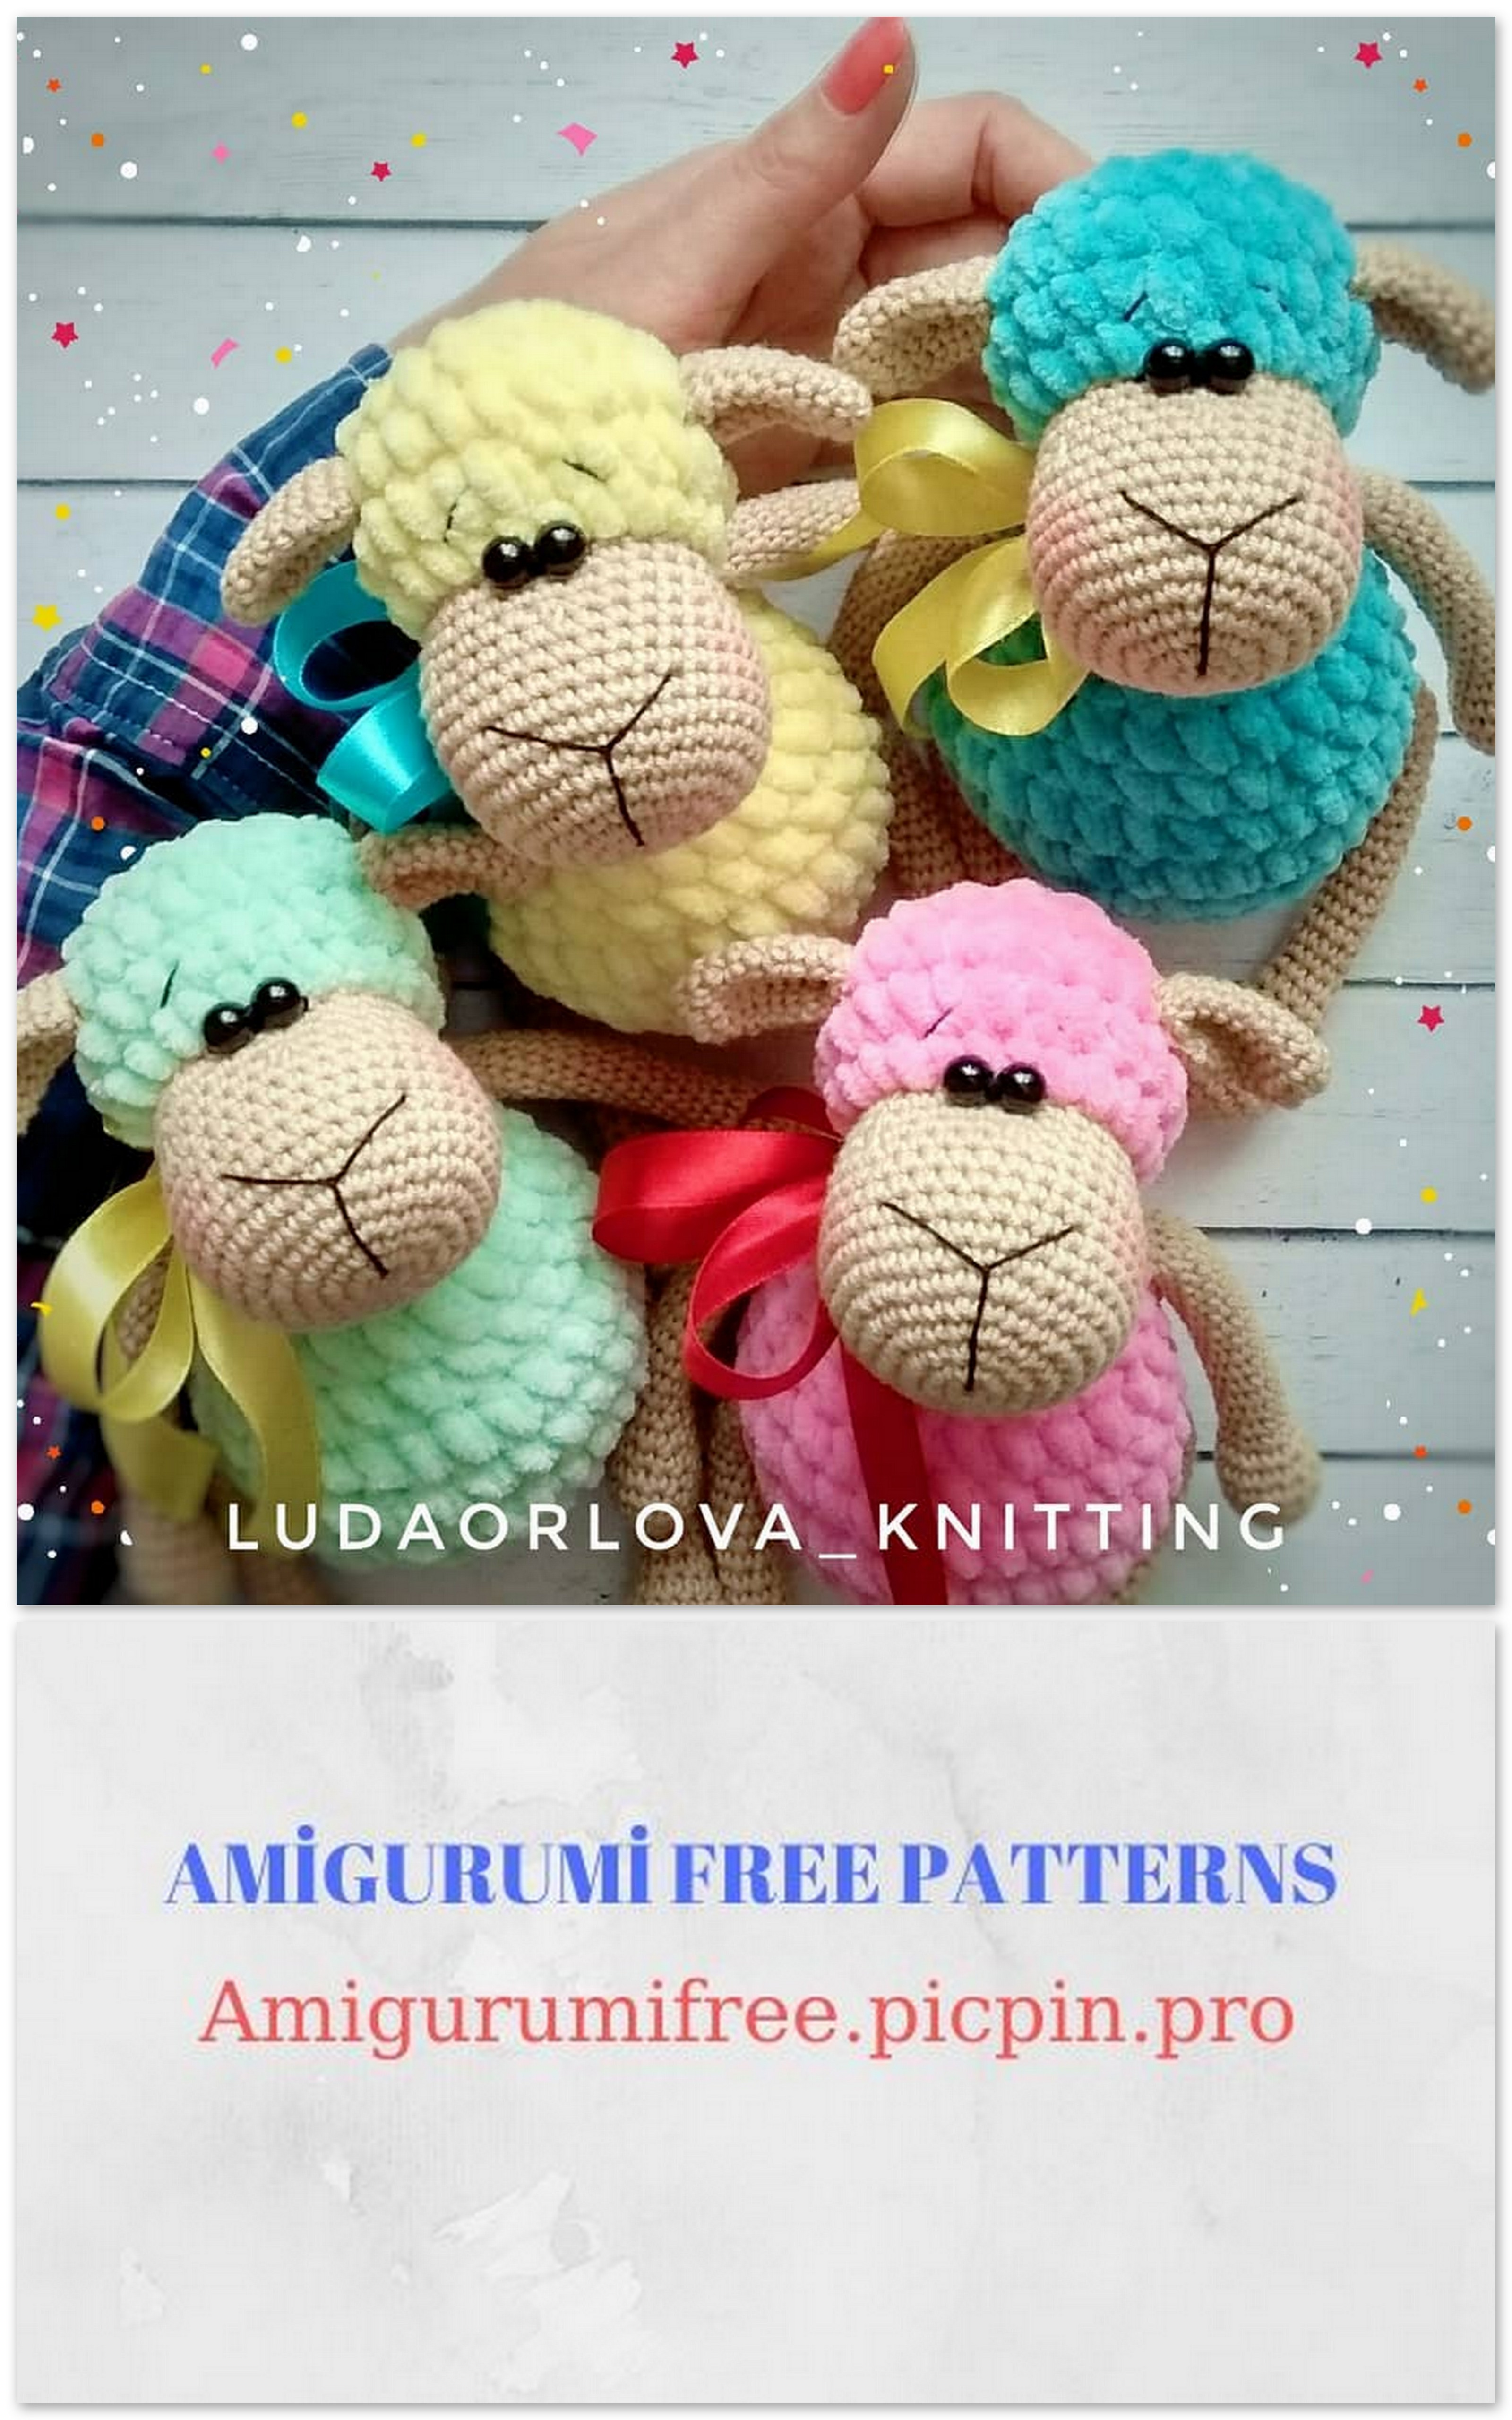 Hippo in swimsuit crochet pattern - Amigurumi Today | 5120x3200